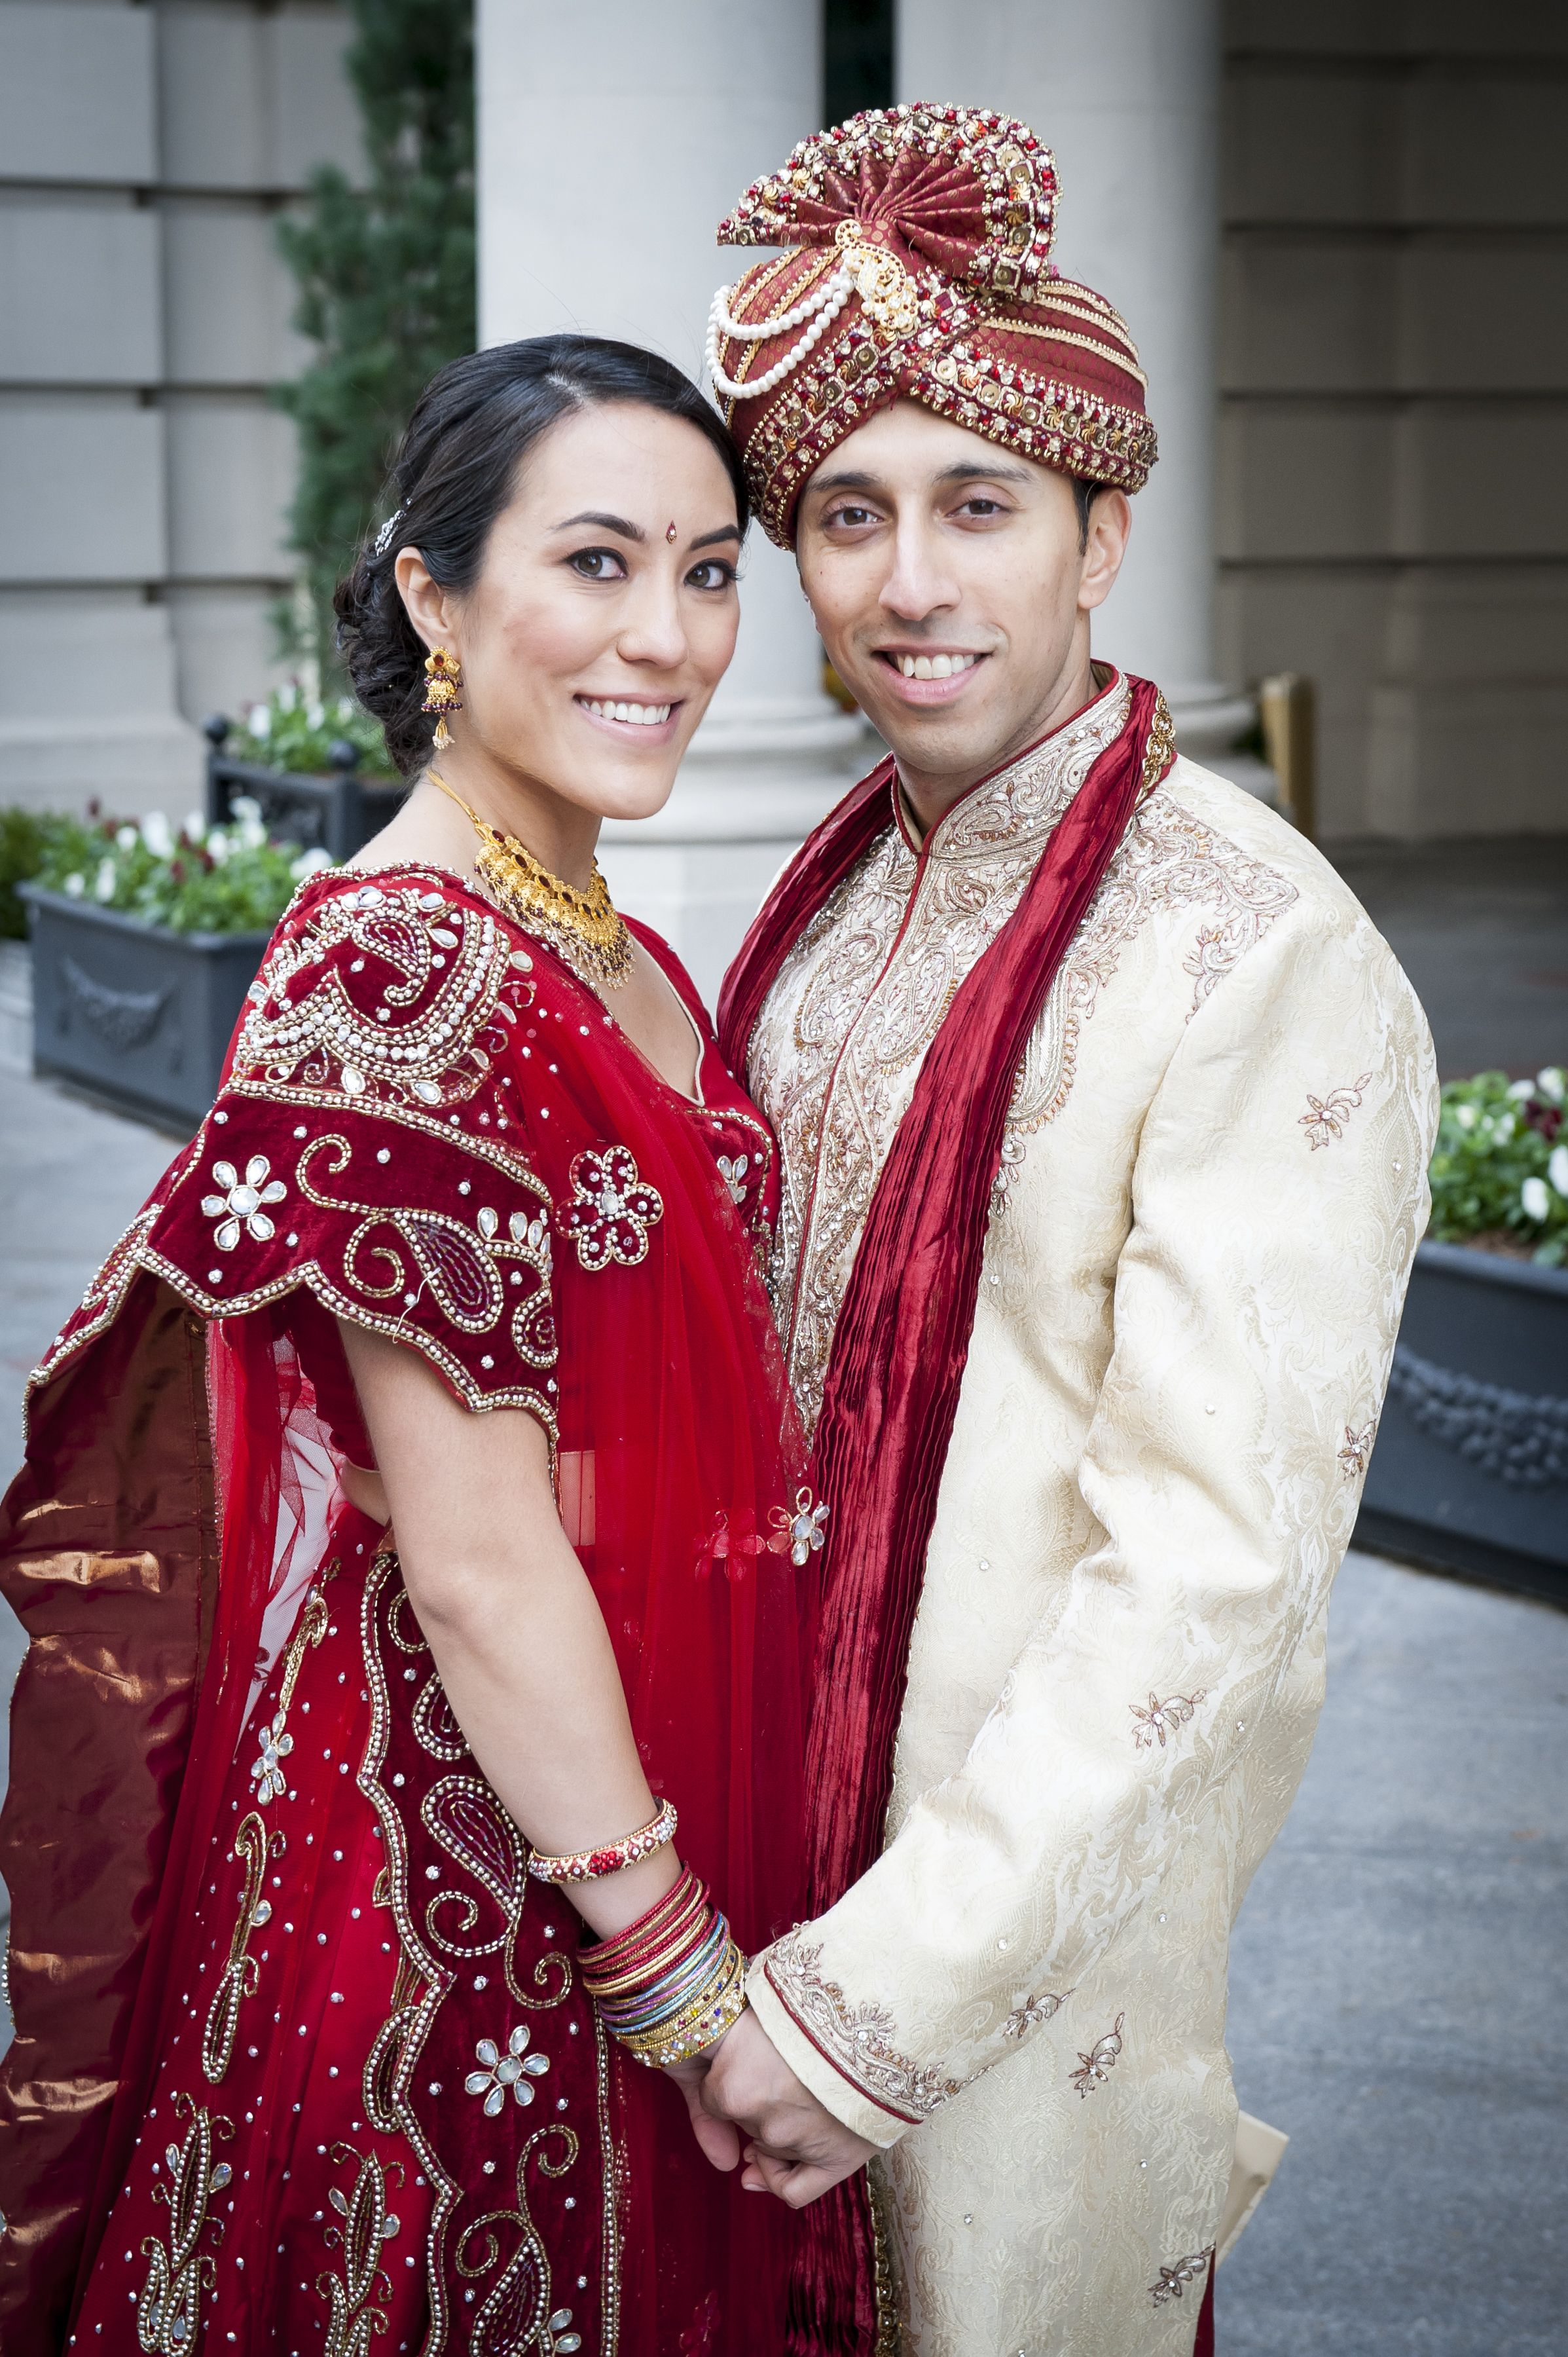 Korean American Bride And Indian Groom Wedding In Dc Www Shaadi Co